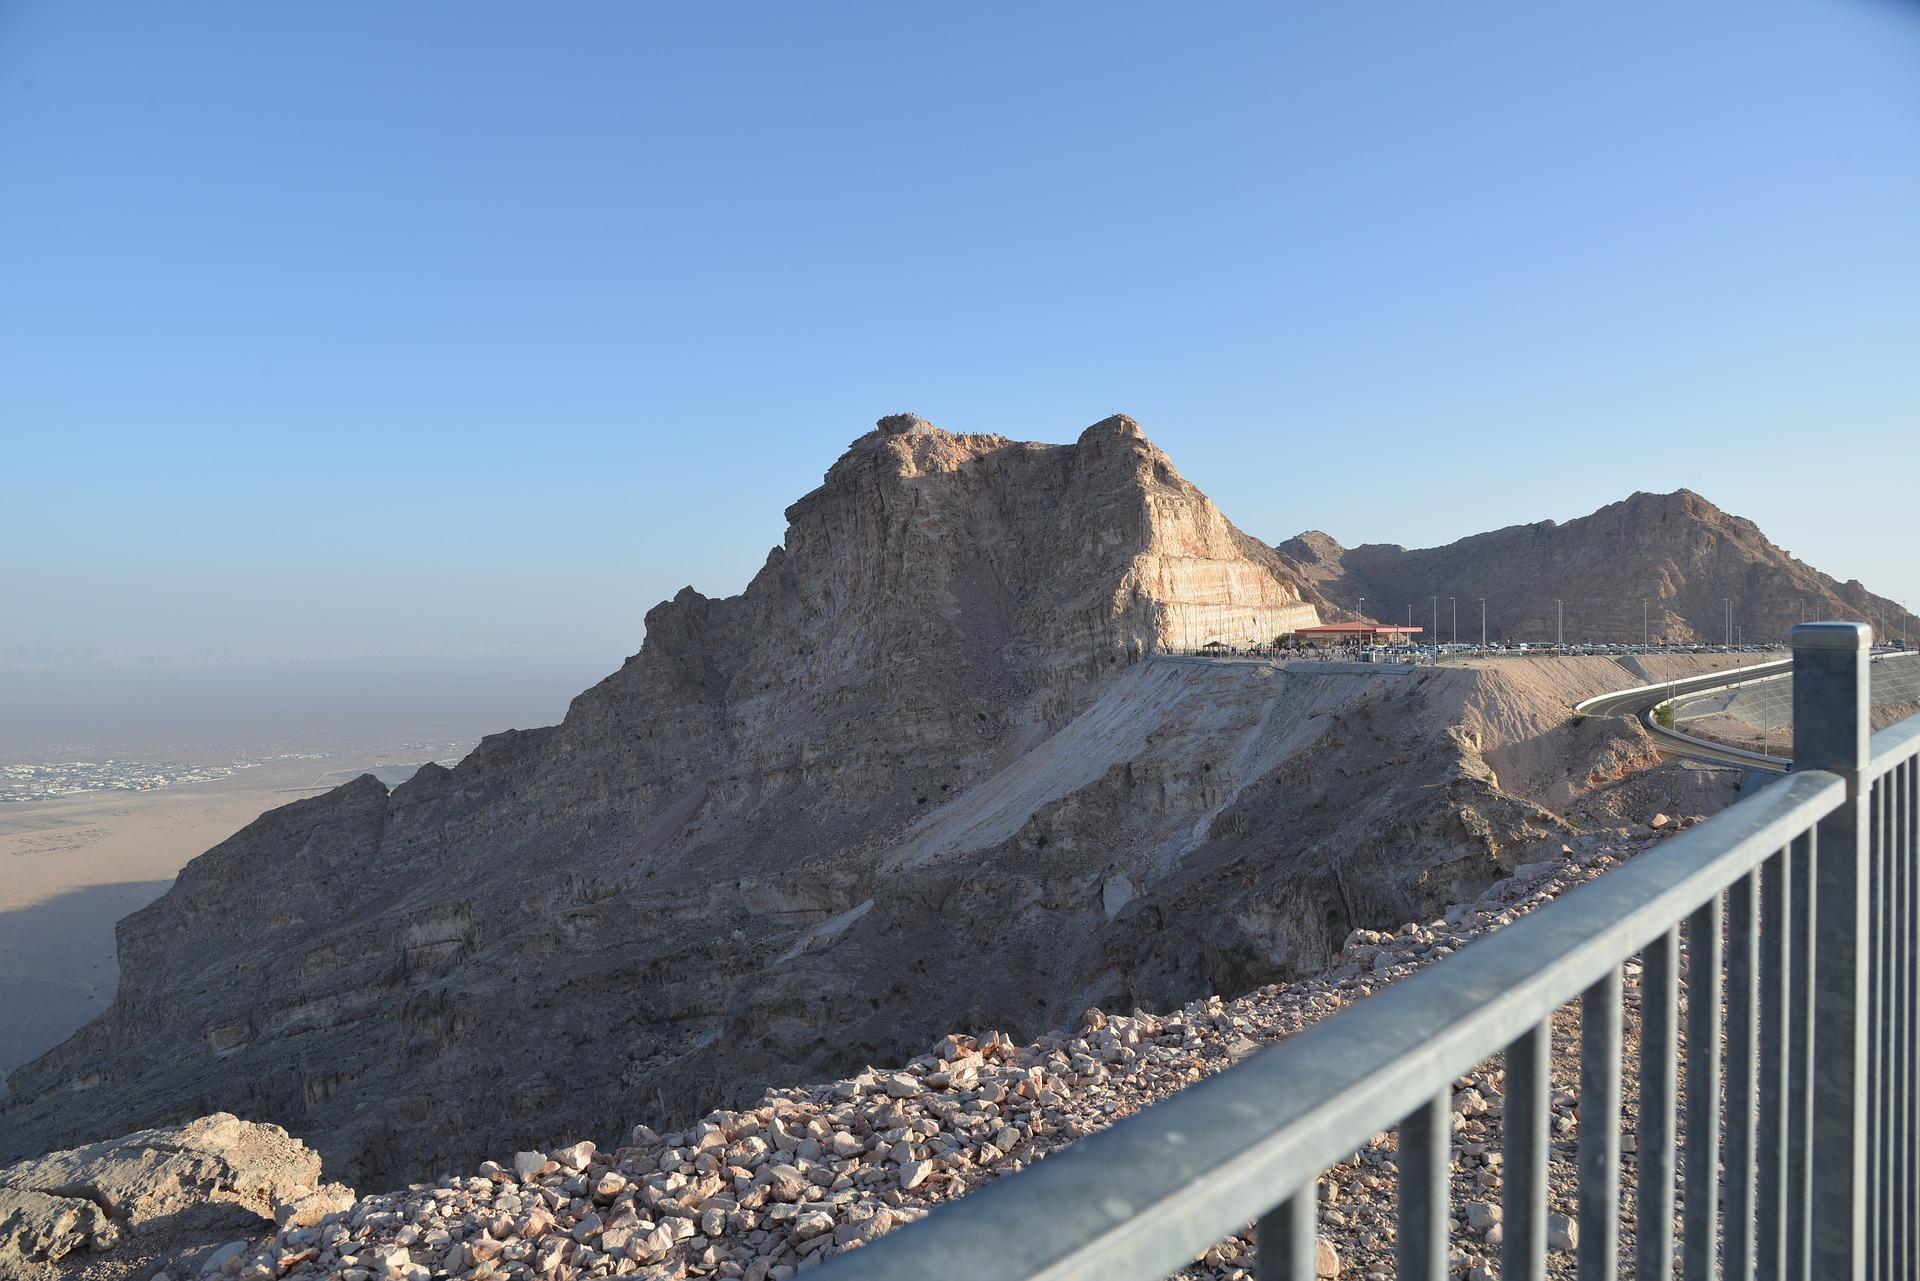 Al Ain Jabal Hafeet